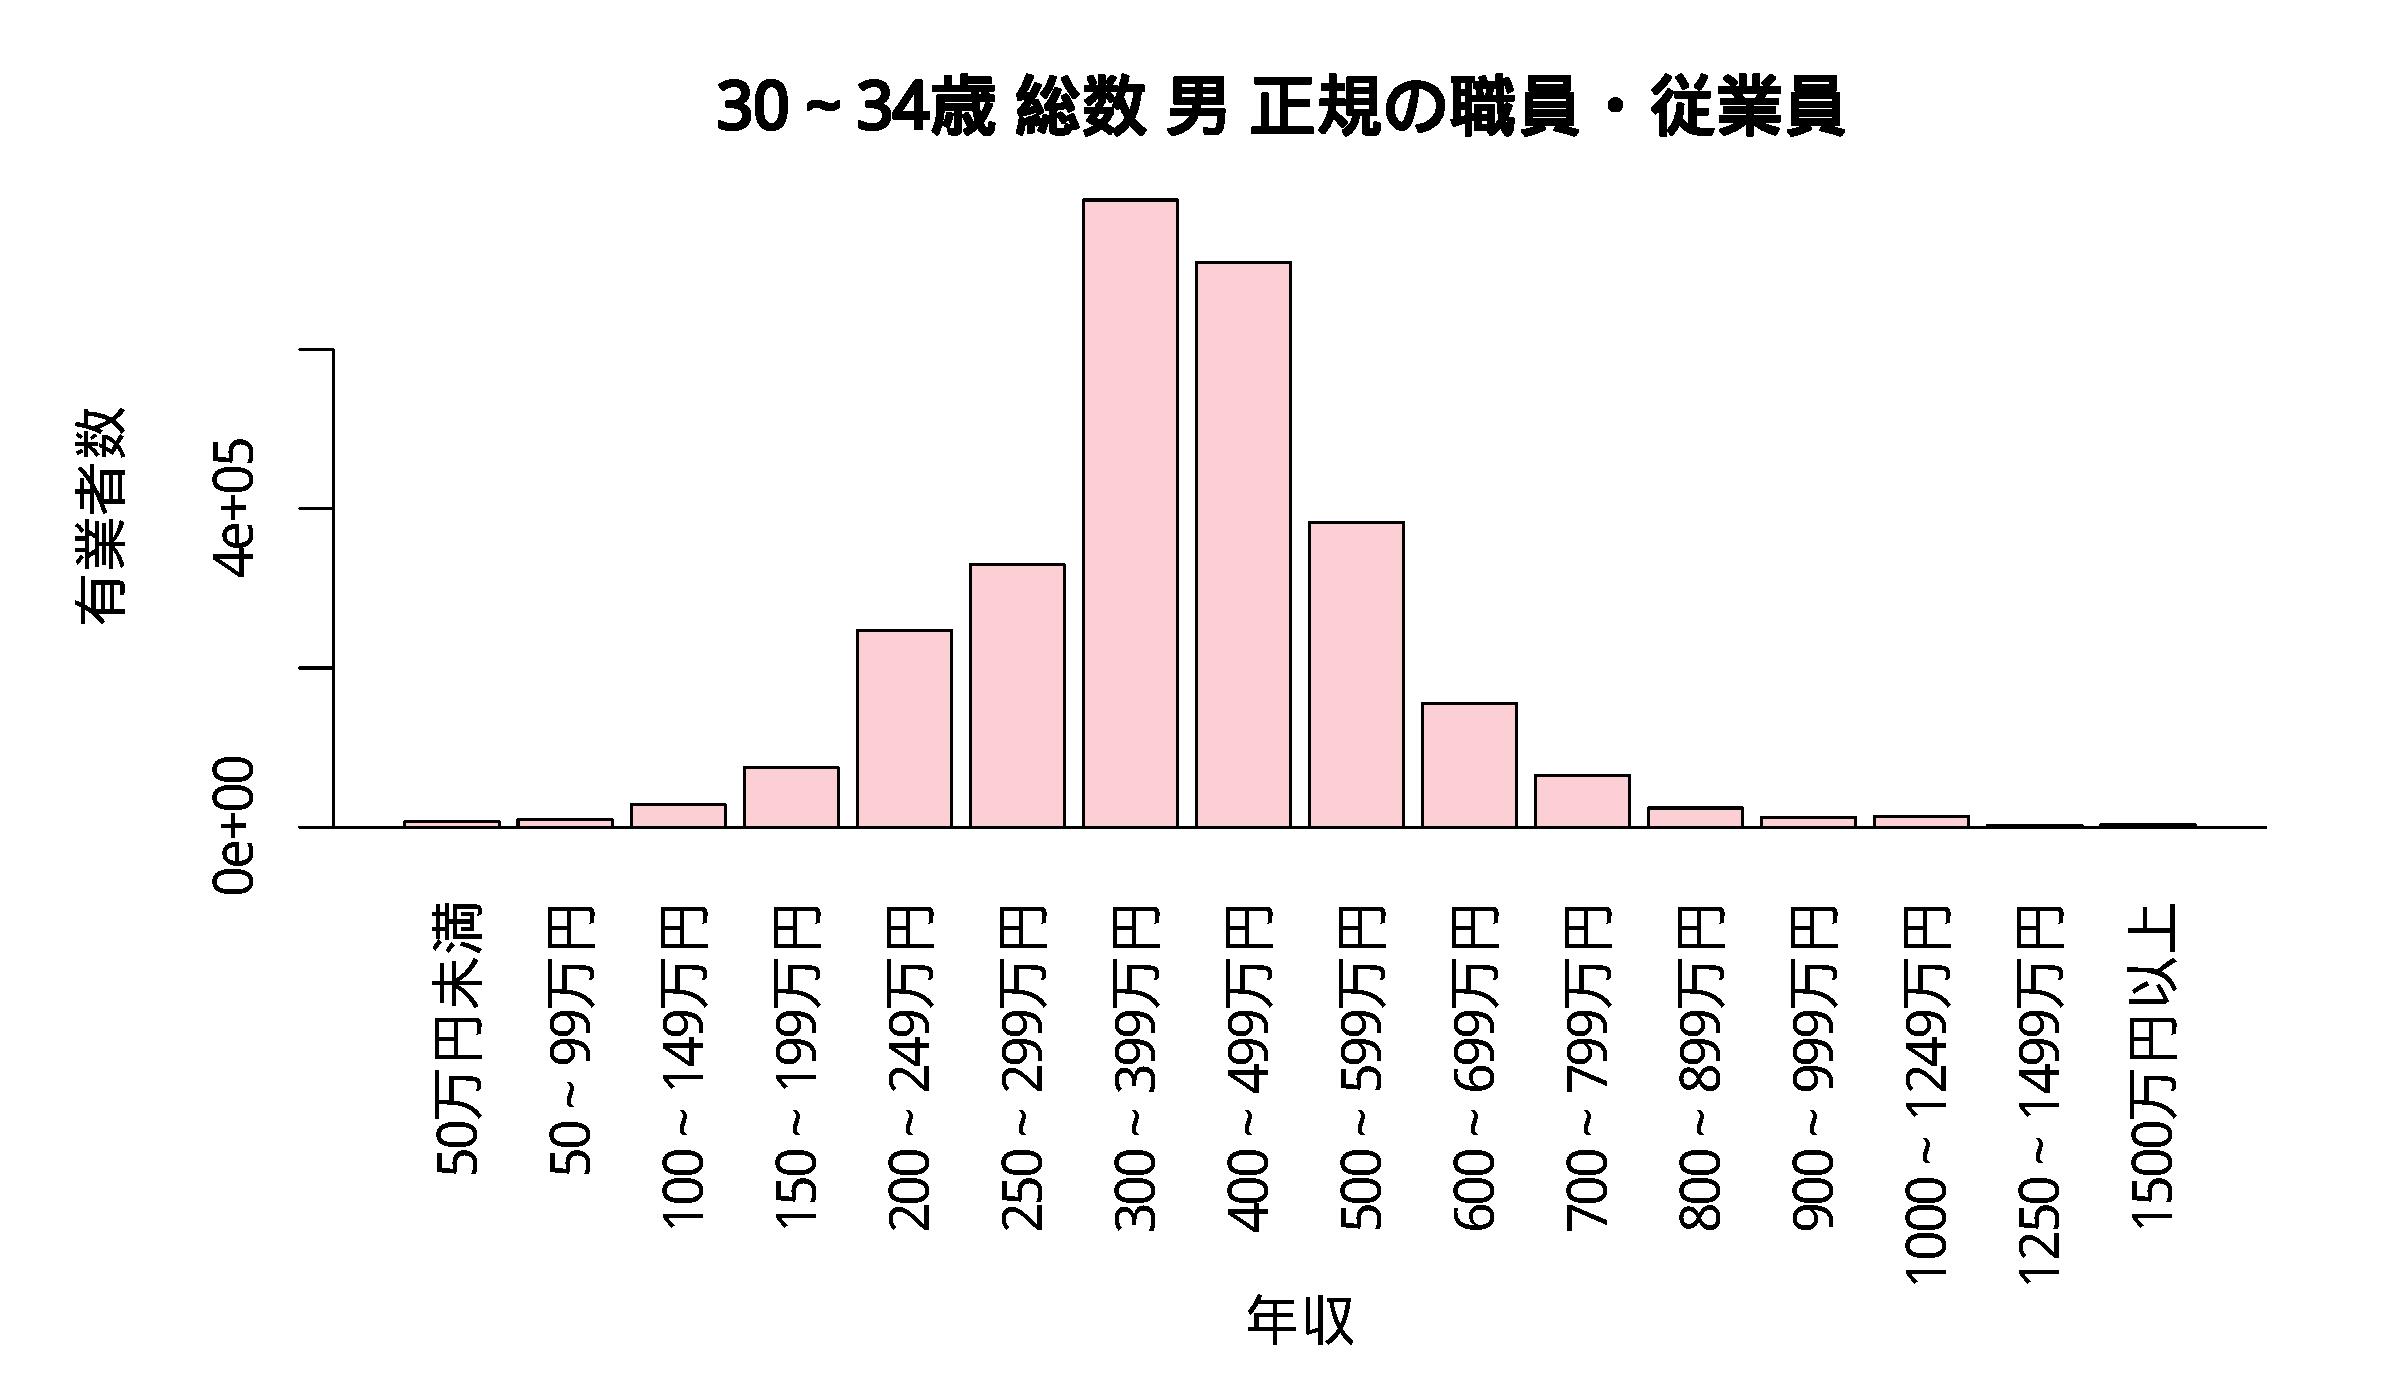 年収分布 30~34歳 総数 男 正規の職員・従業員